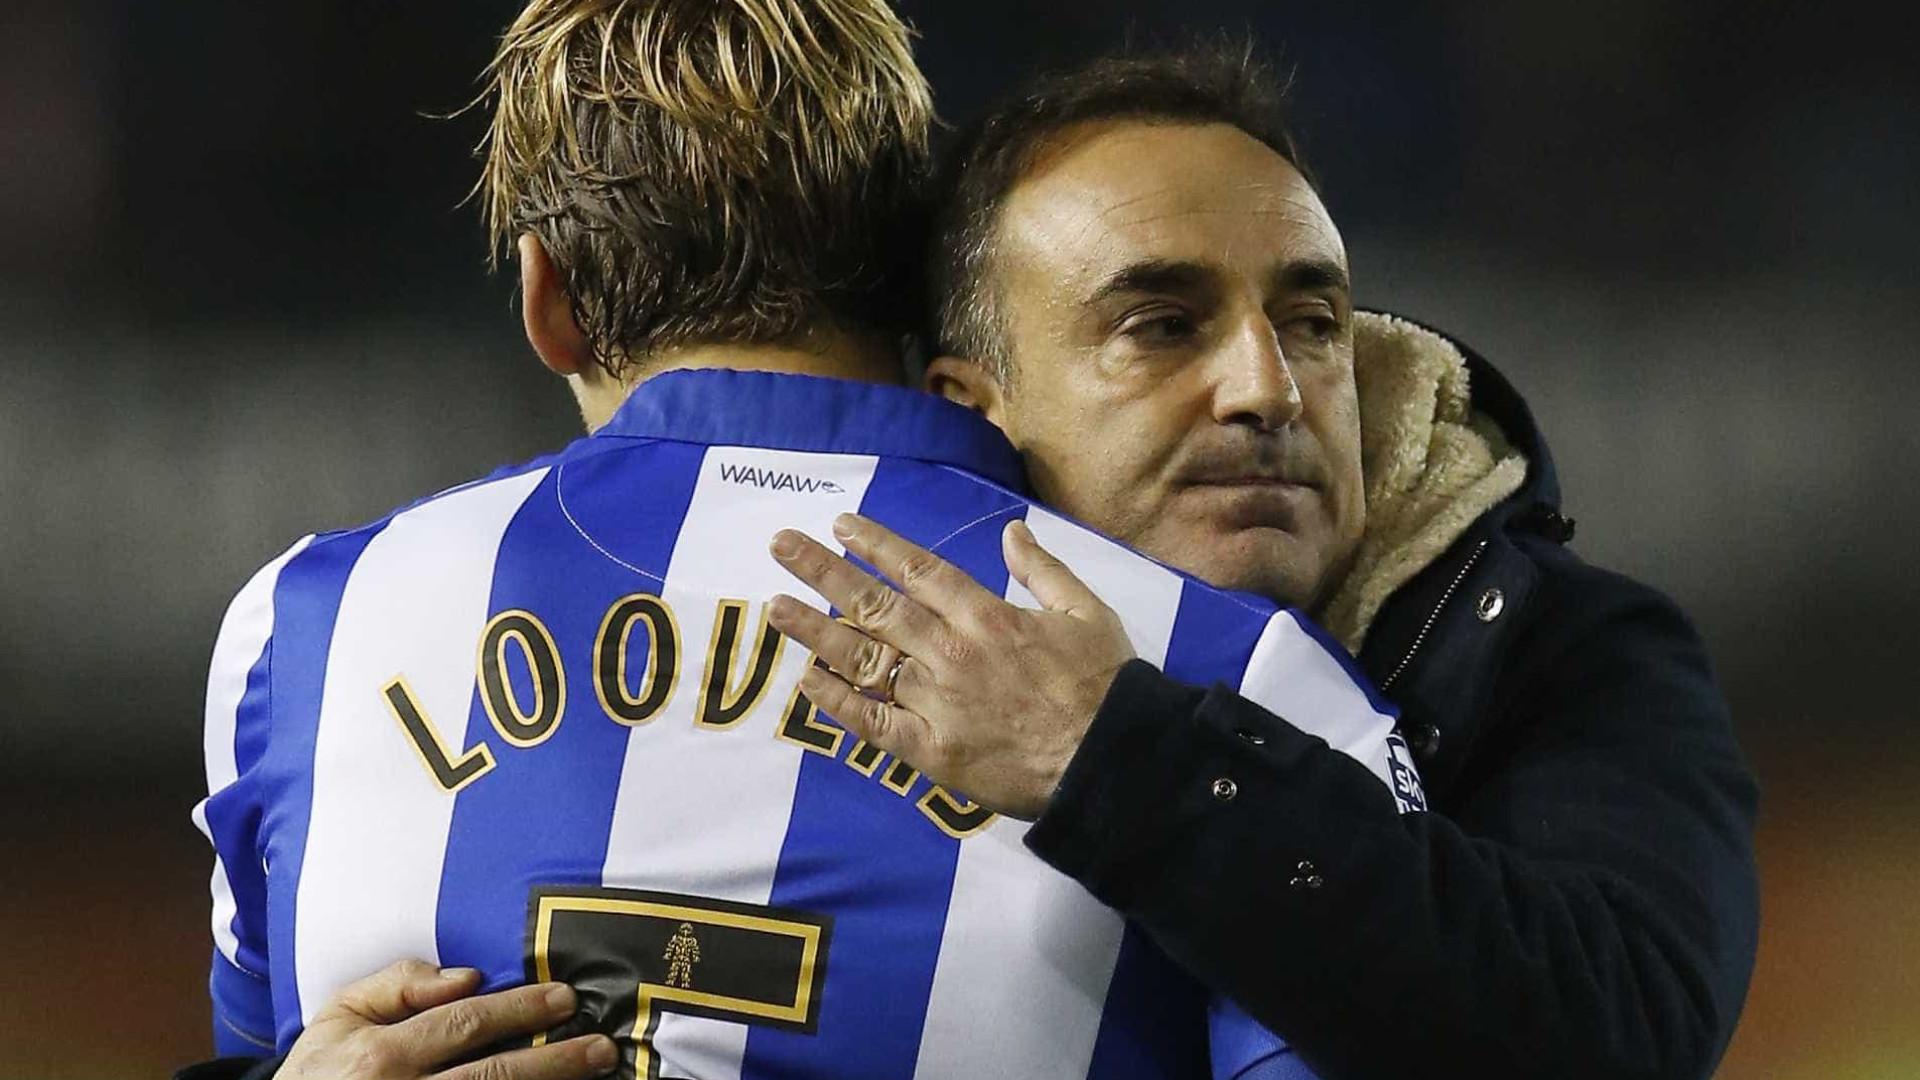 Ingleses colocam Carlos Carvalhal na rota do FC Porto